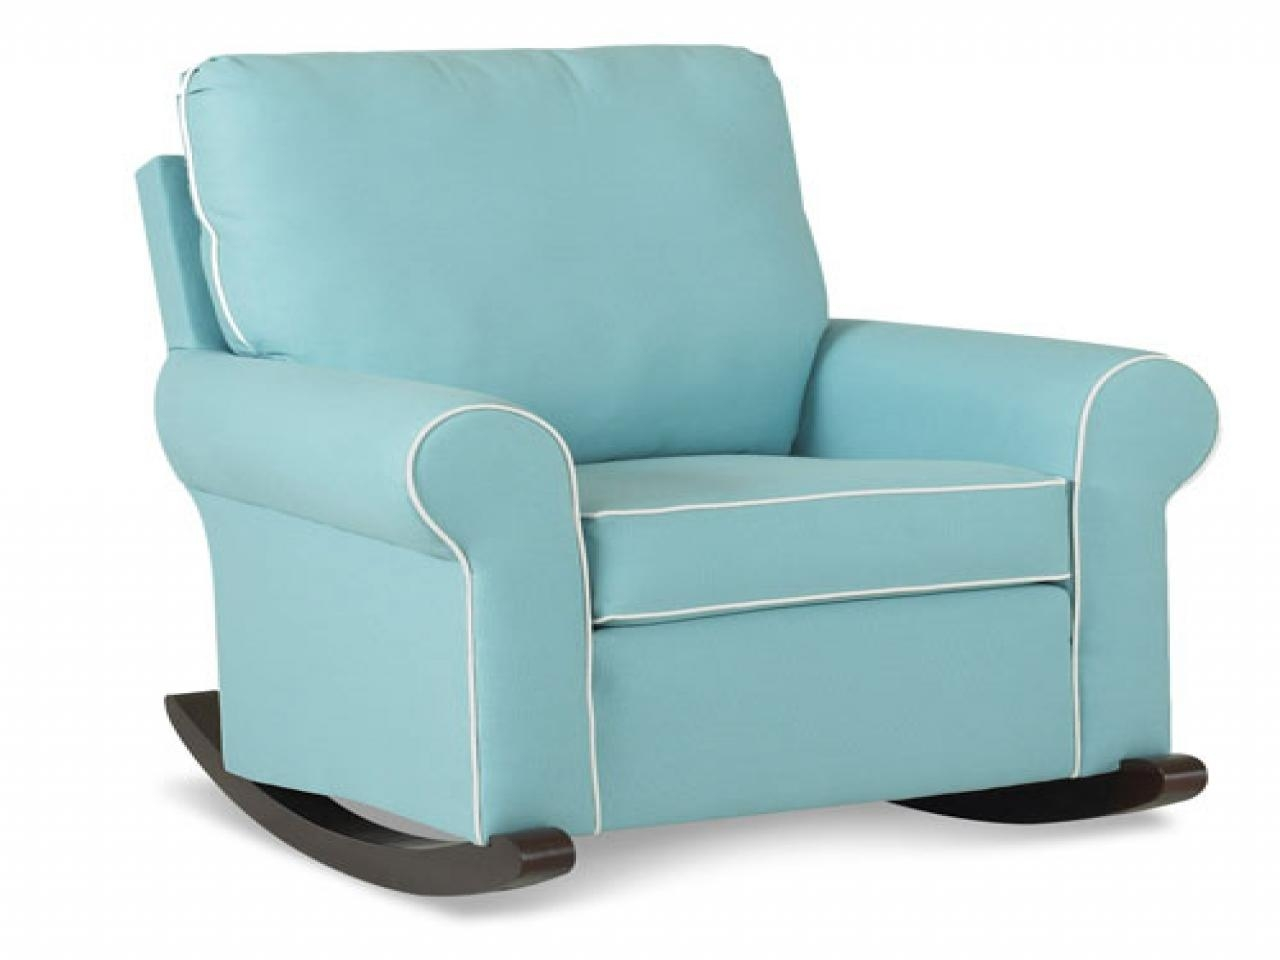 20 Top Sofa Rocking Chairs  Sofa Ideas